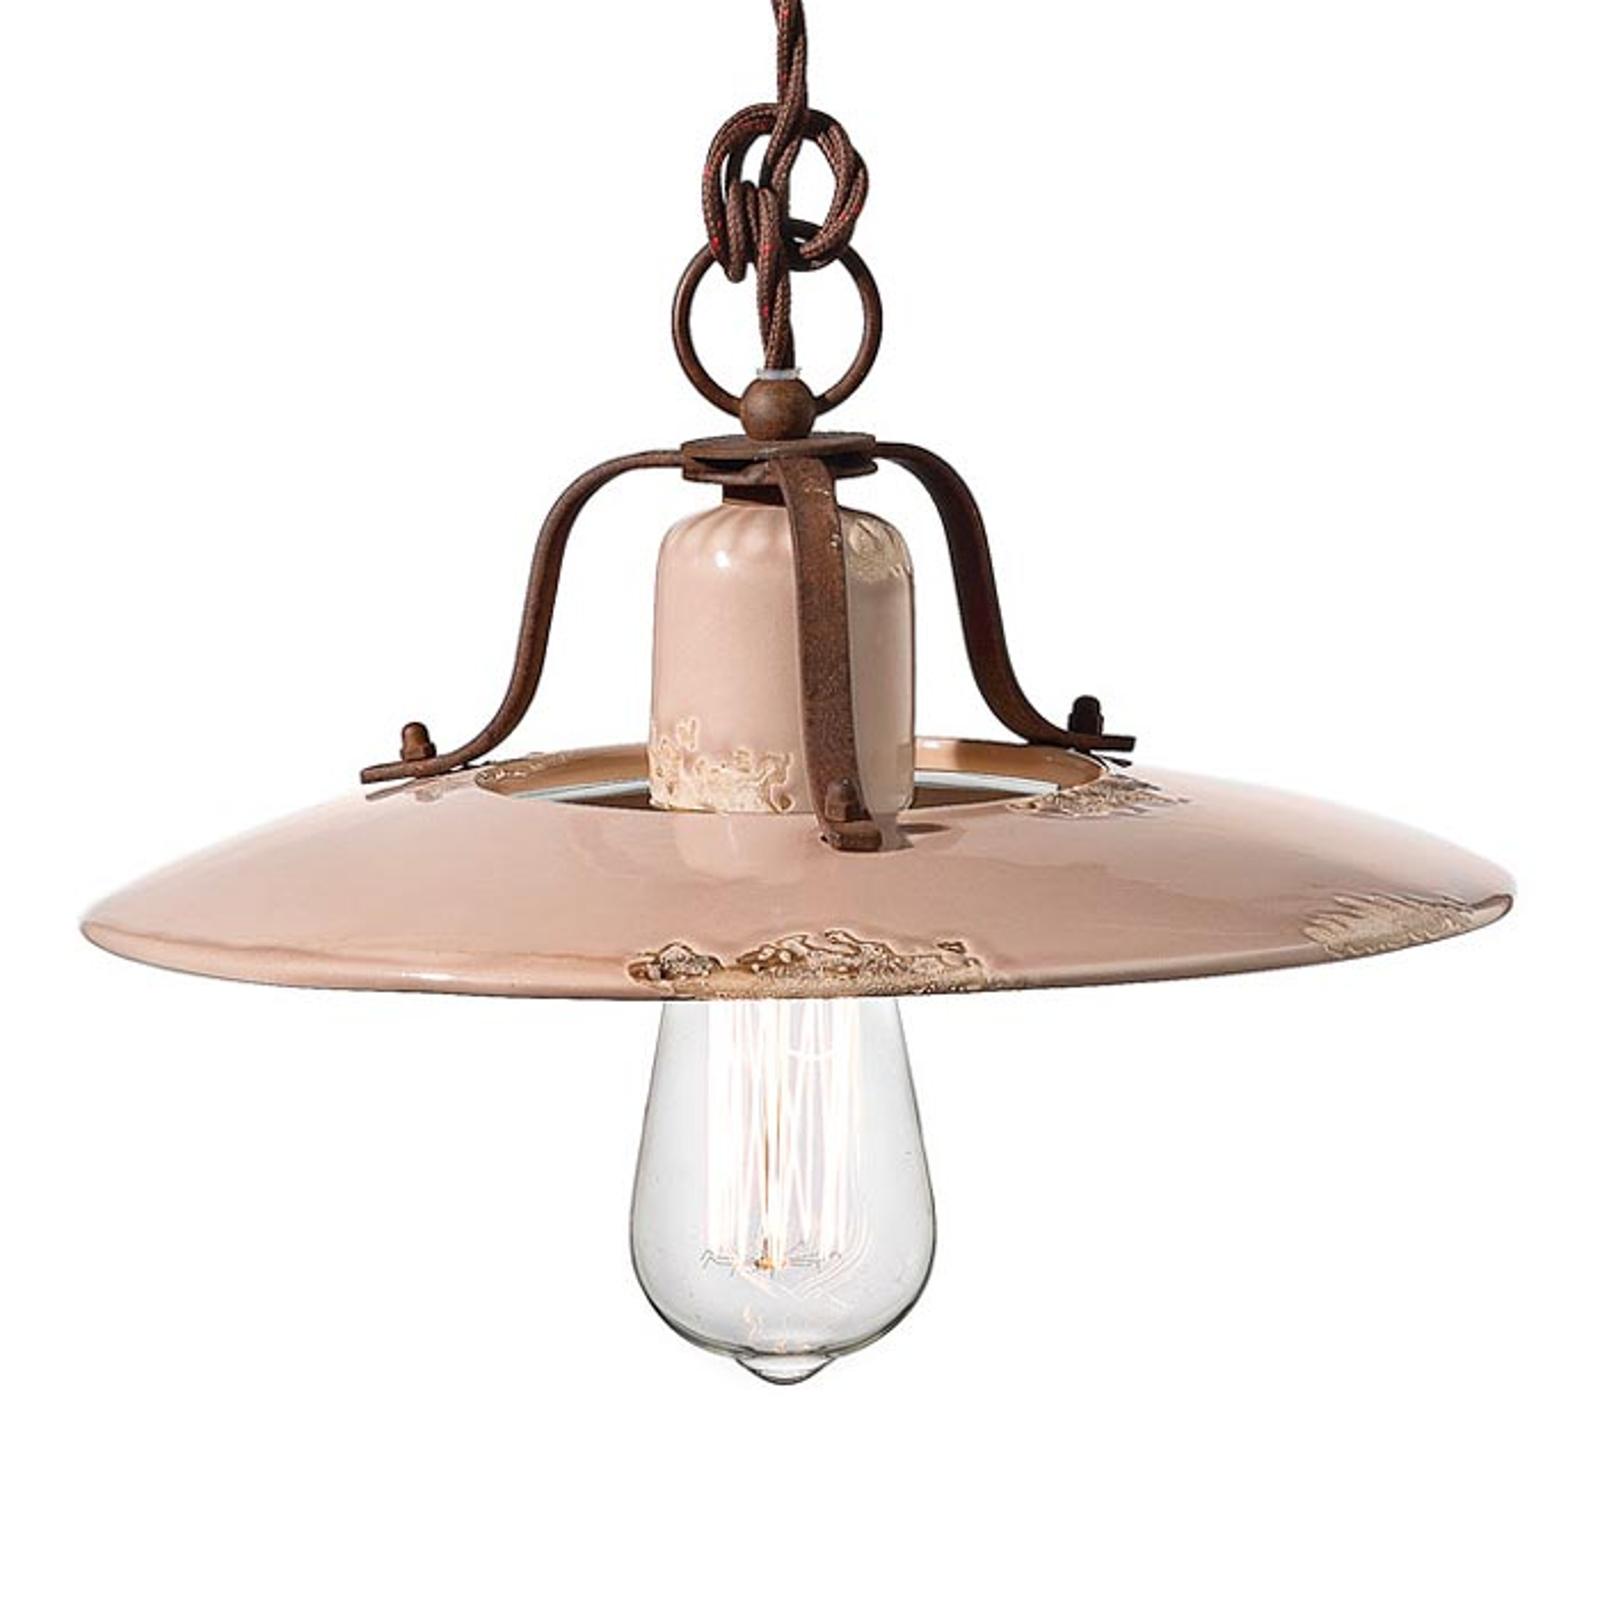 Keramische hanglamp Giorgia, 30 cm, oud roze